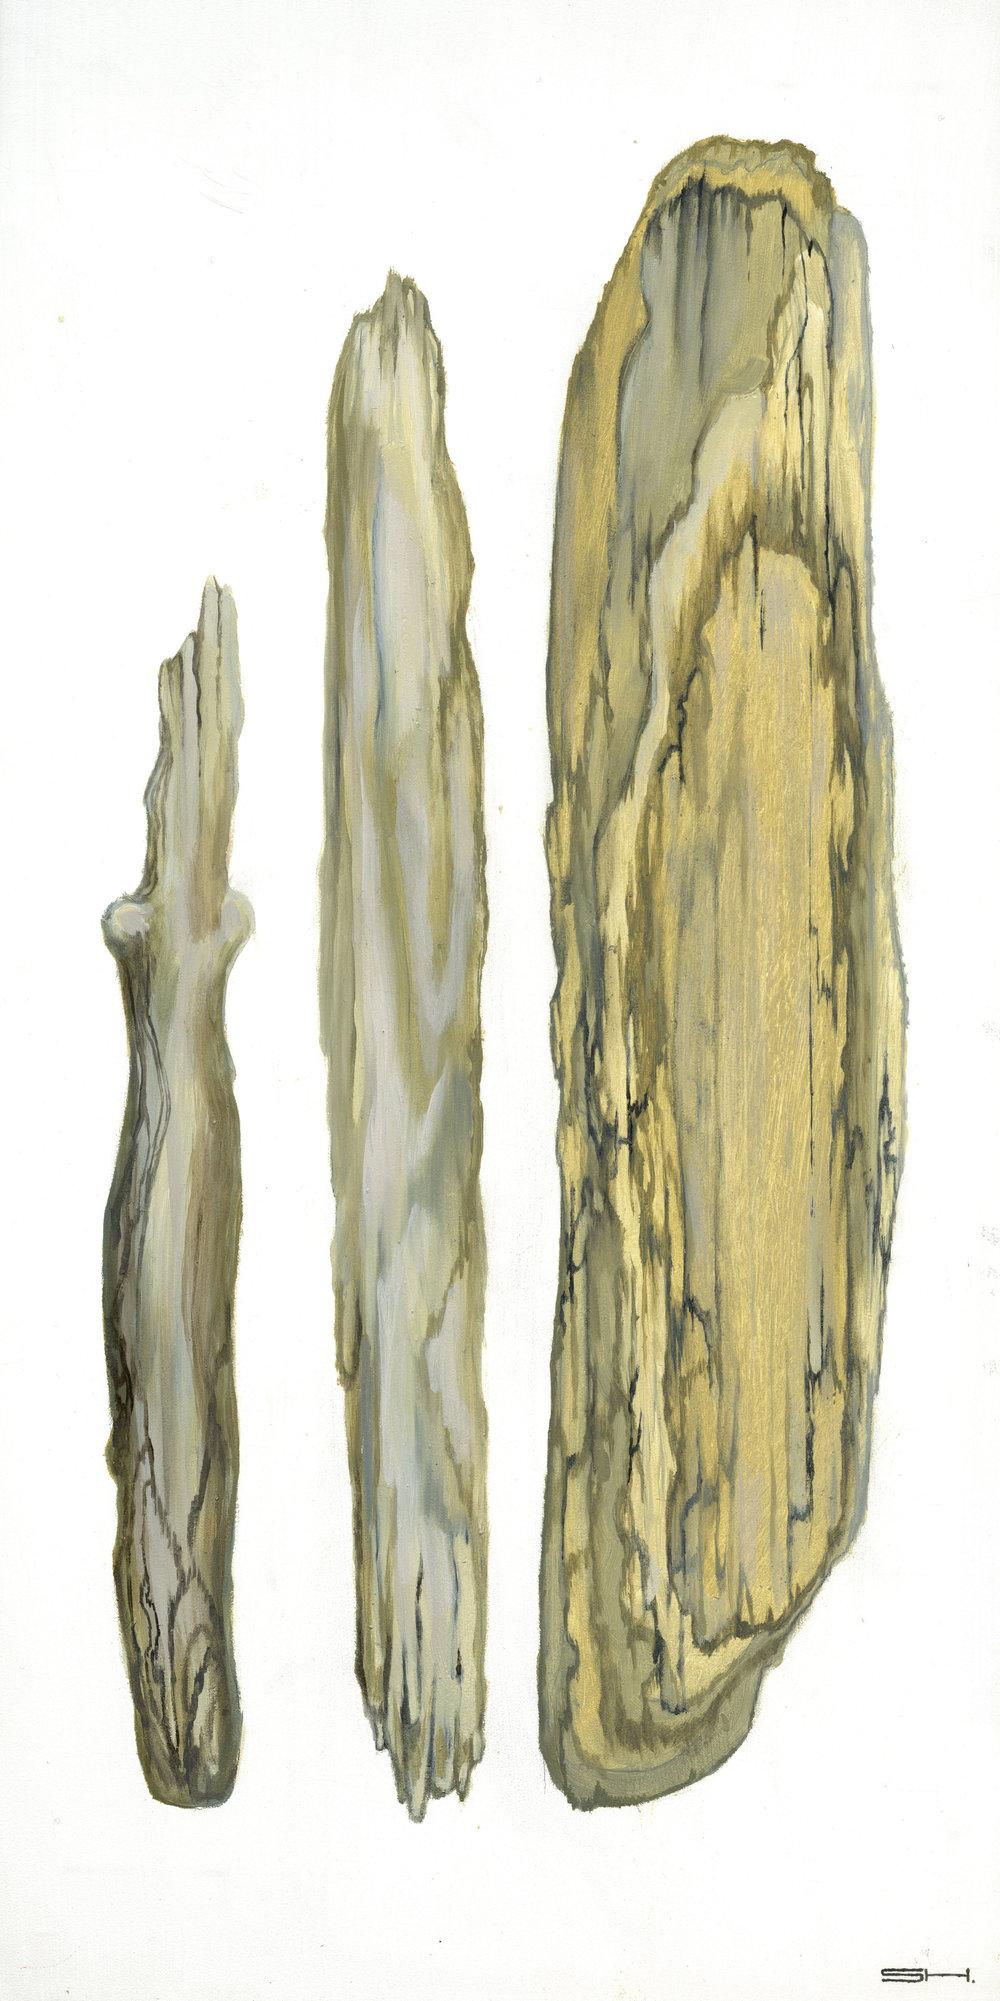 driftwood16.jpg